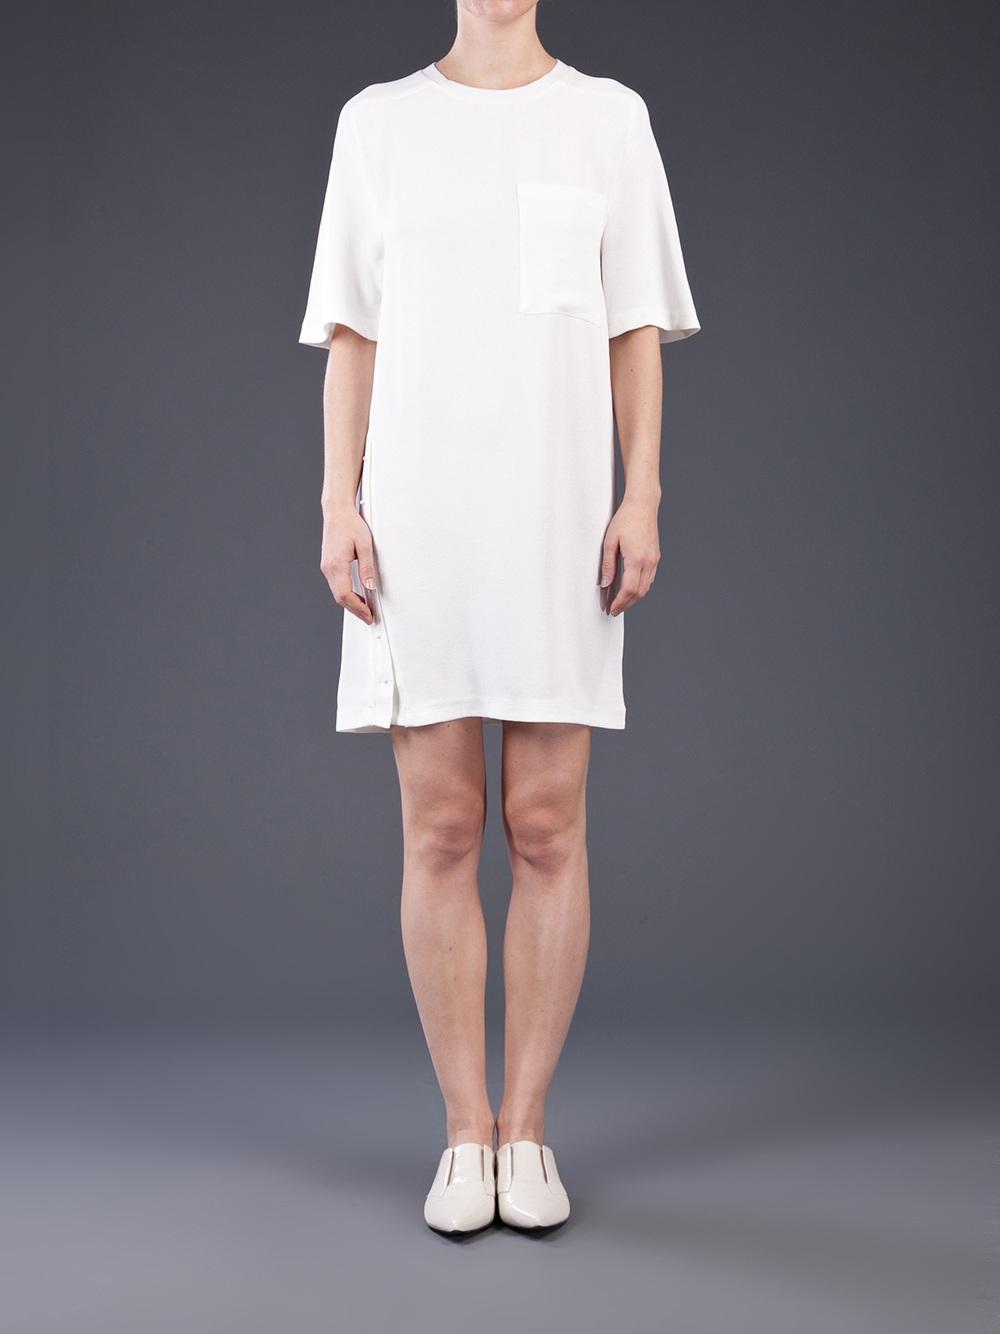 Women S White Crew Neck T Shirt